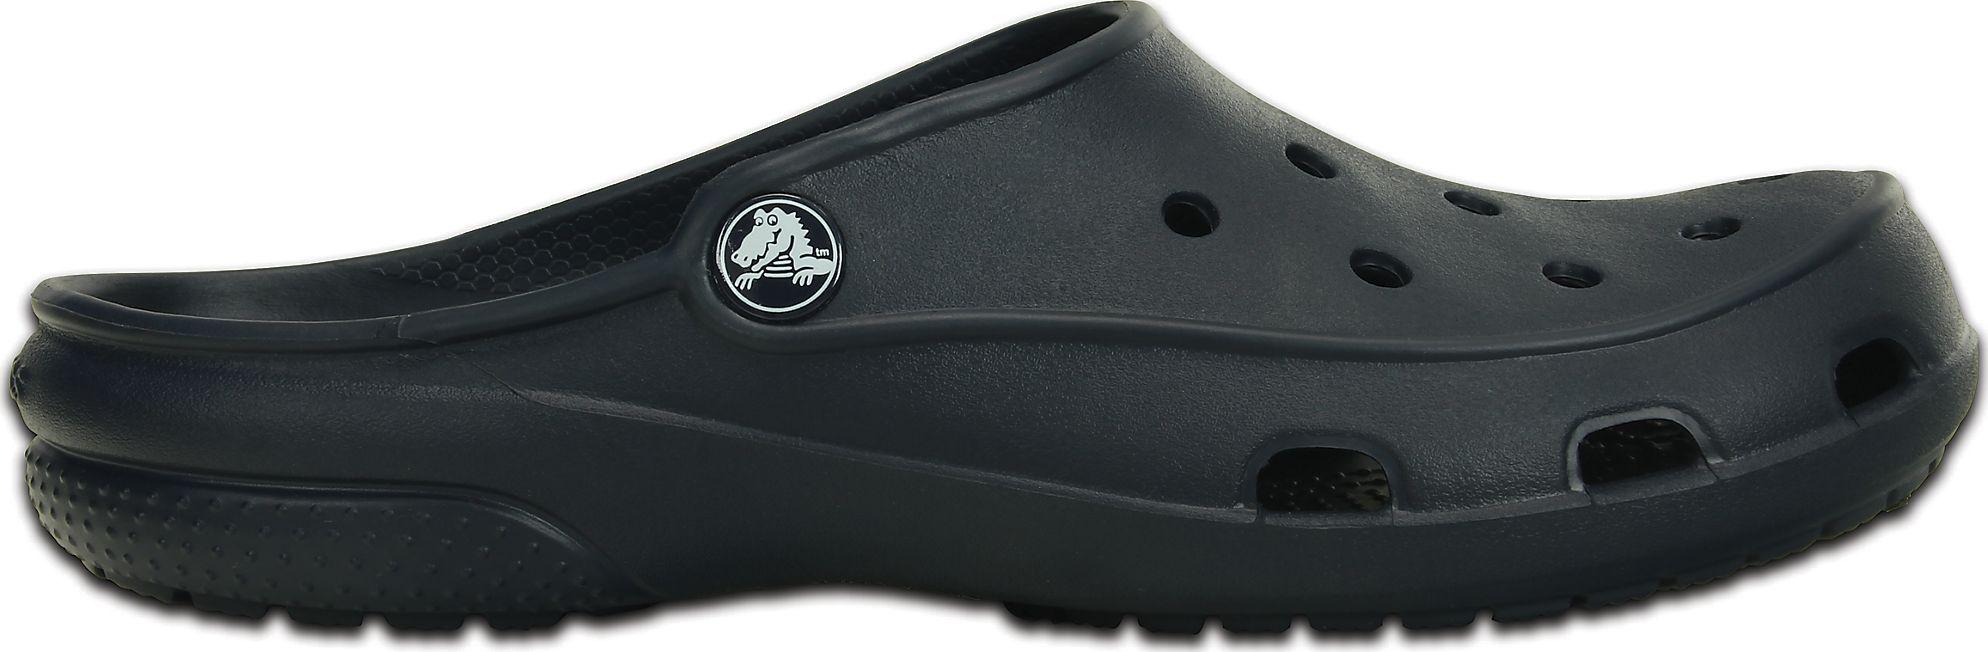 Crocs™ Women's Crocs Freesail Clog Navy 39,5